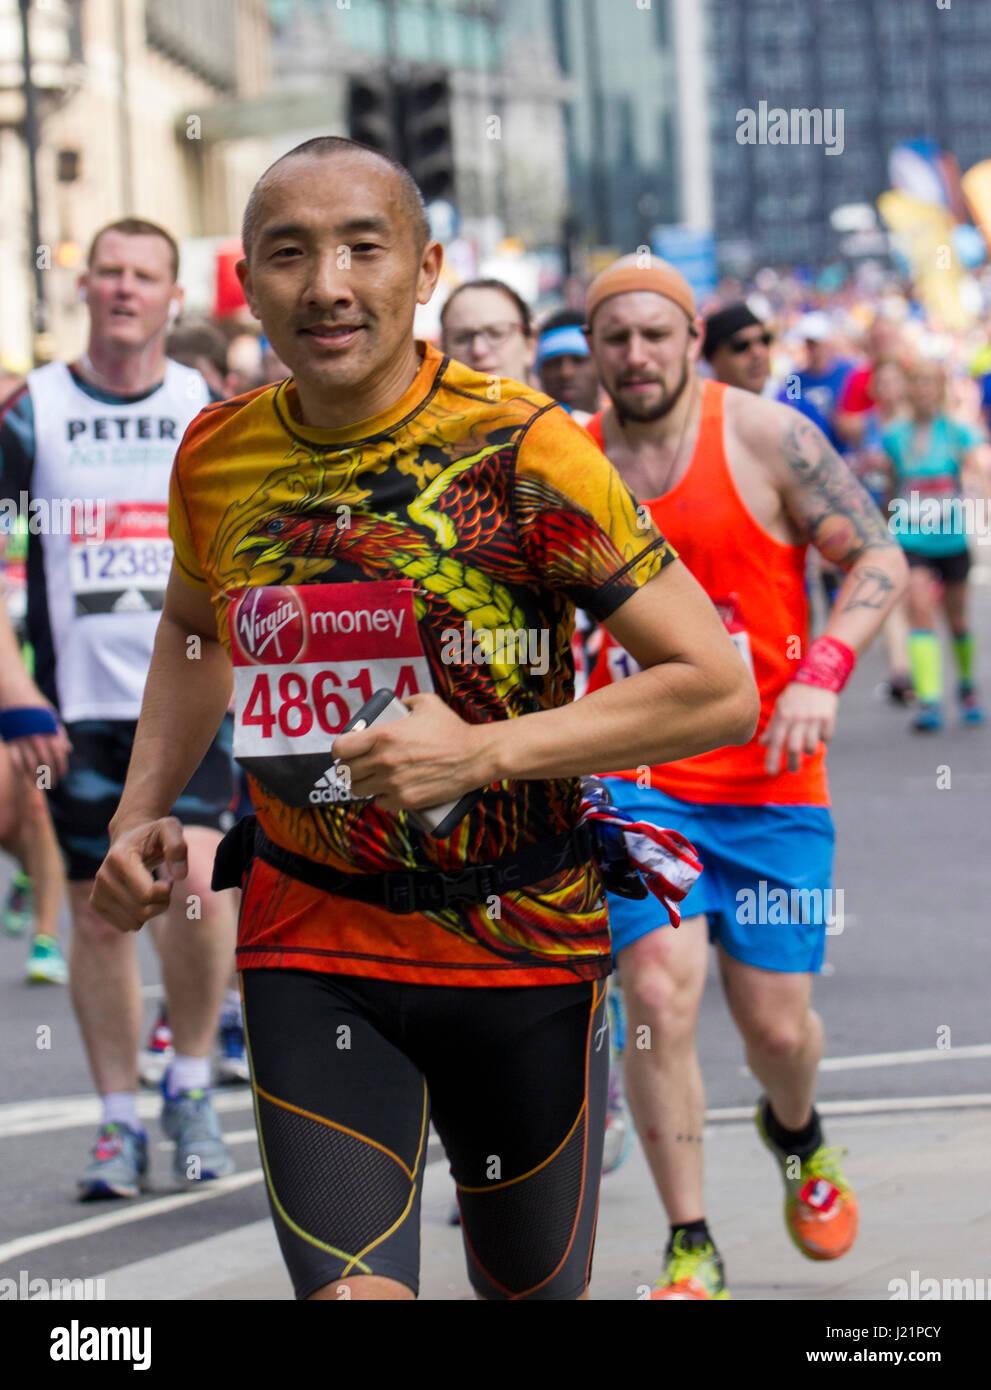 St Jame's Park, London, UK. 23rd Apr, 2017. Thousands take part in the 37th London Marathon Credit: Alan Fraser/Alamy - Stock Image